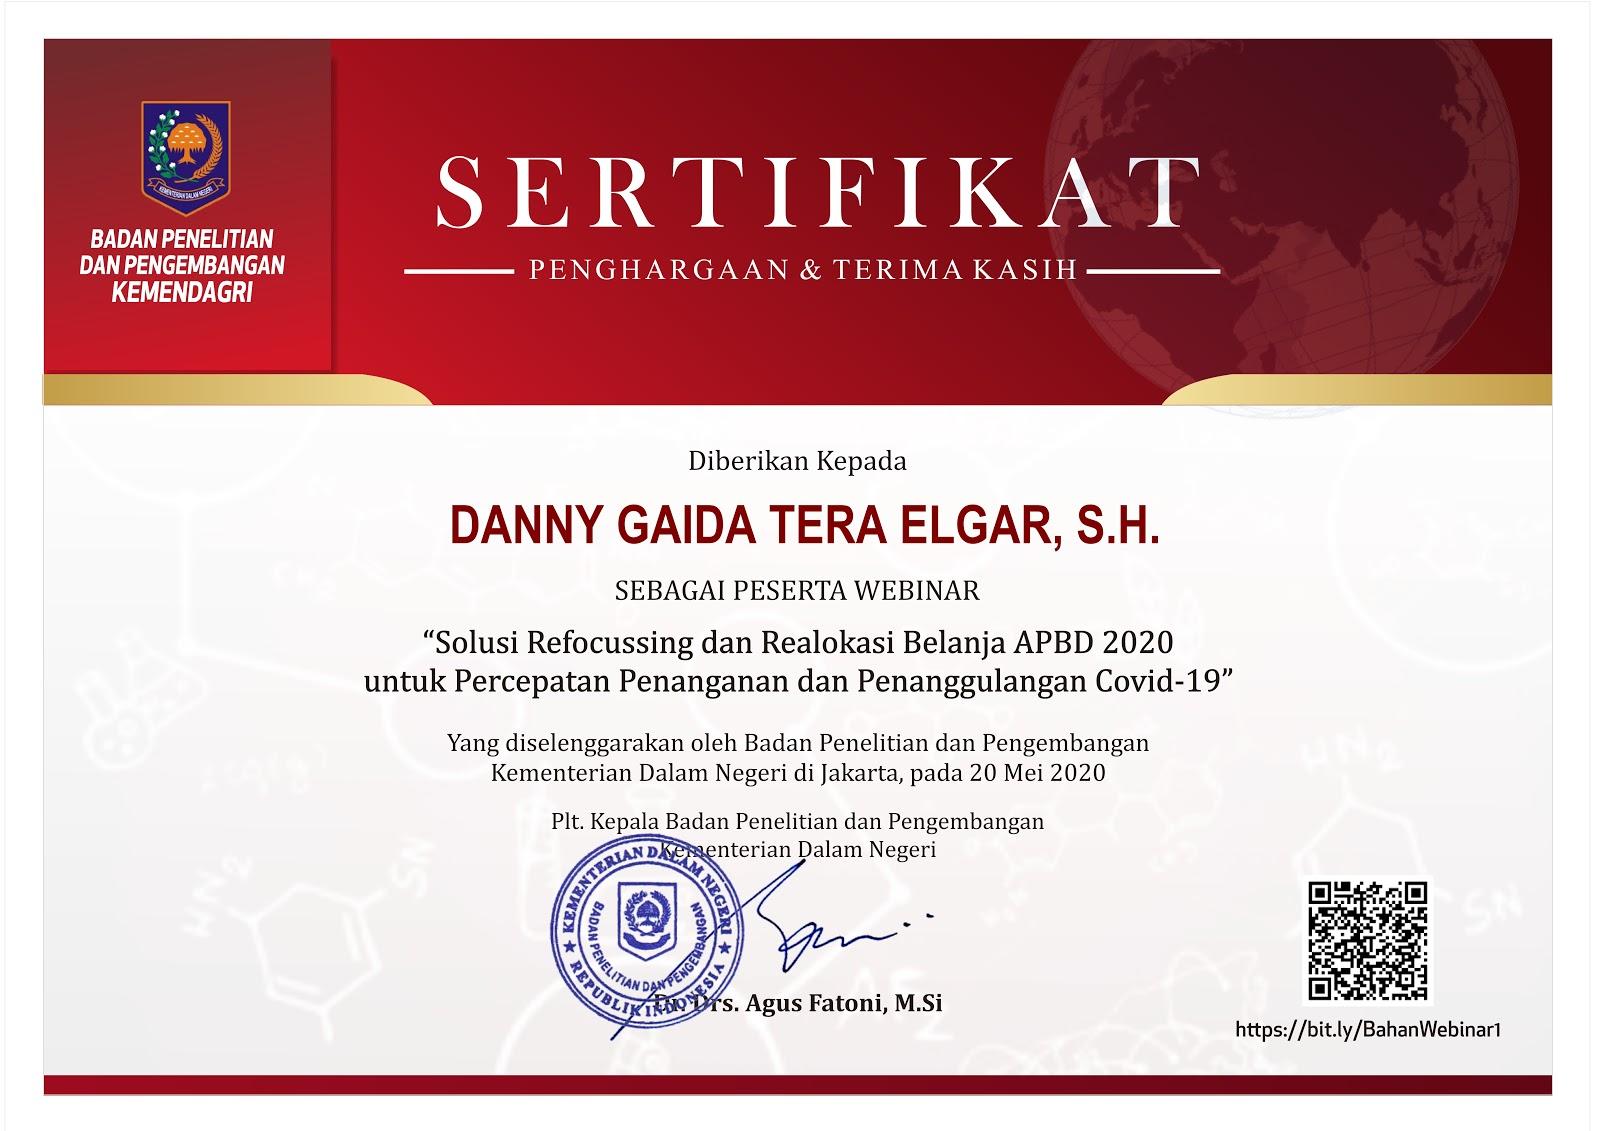 "Piagam Penghargaan Badan Penelitian dan Pengembangan Kementerian Dalam Negeri Republik Indonesia (Kemendagri RI) ""Solusi Refocussing dan Realokasi Belanja APBD 2020 untuk Percepatan Penanganan dan Penanggulangan Covid-19"""